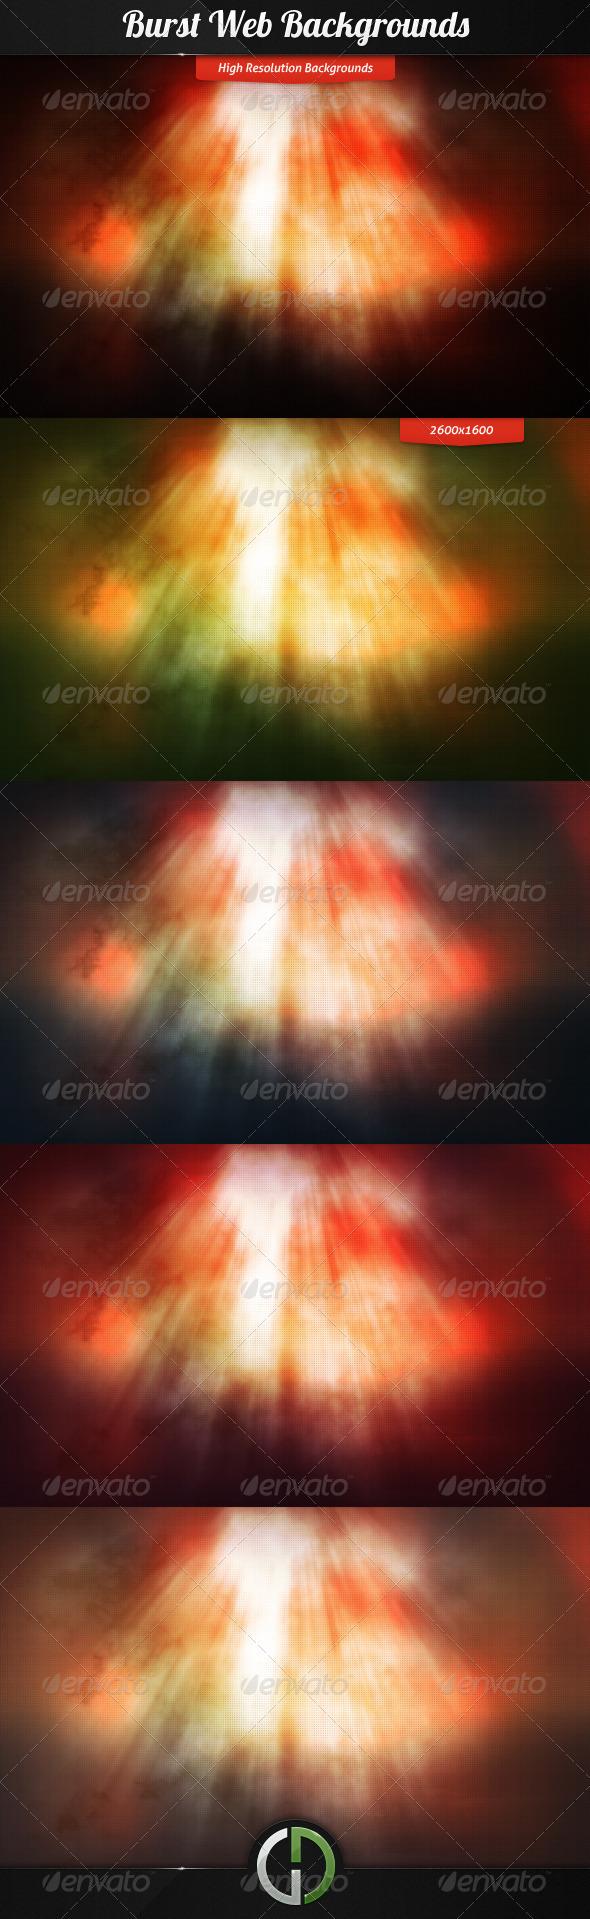 Burst Web Backgrounds - Backgrounds Graphics